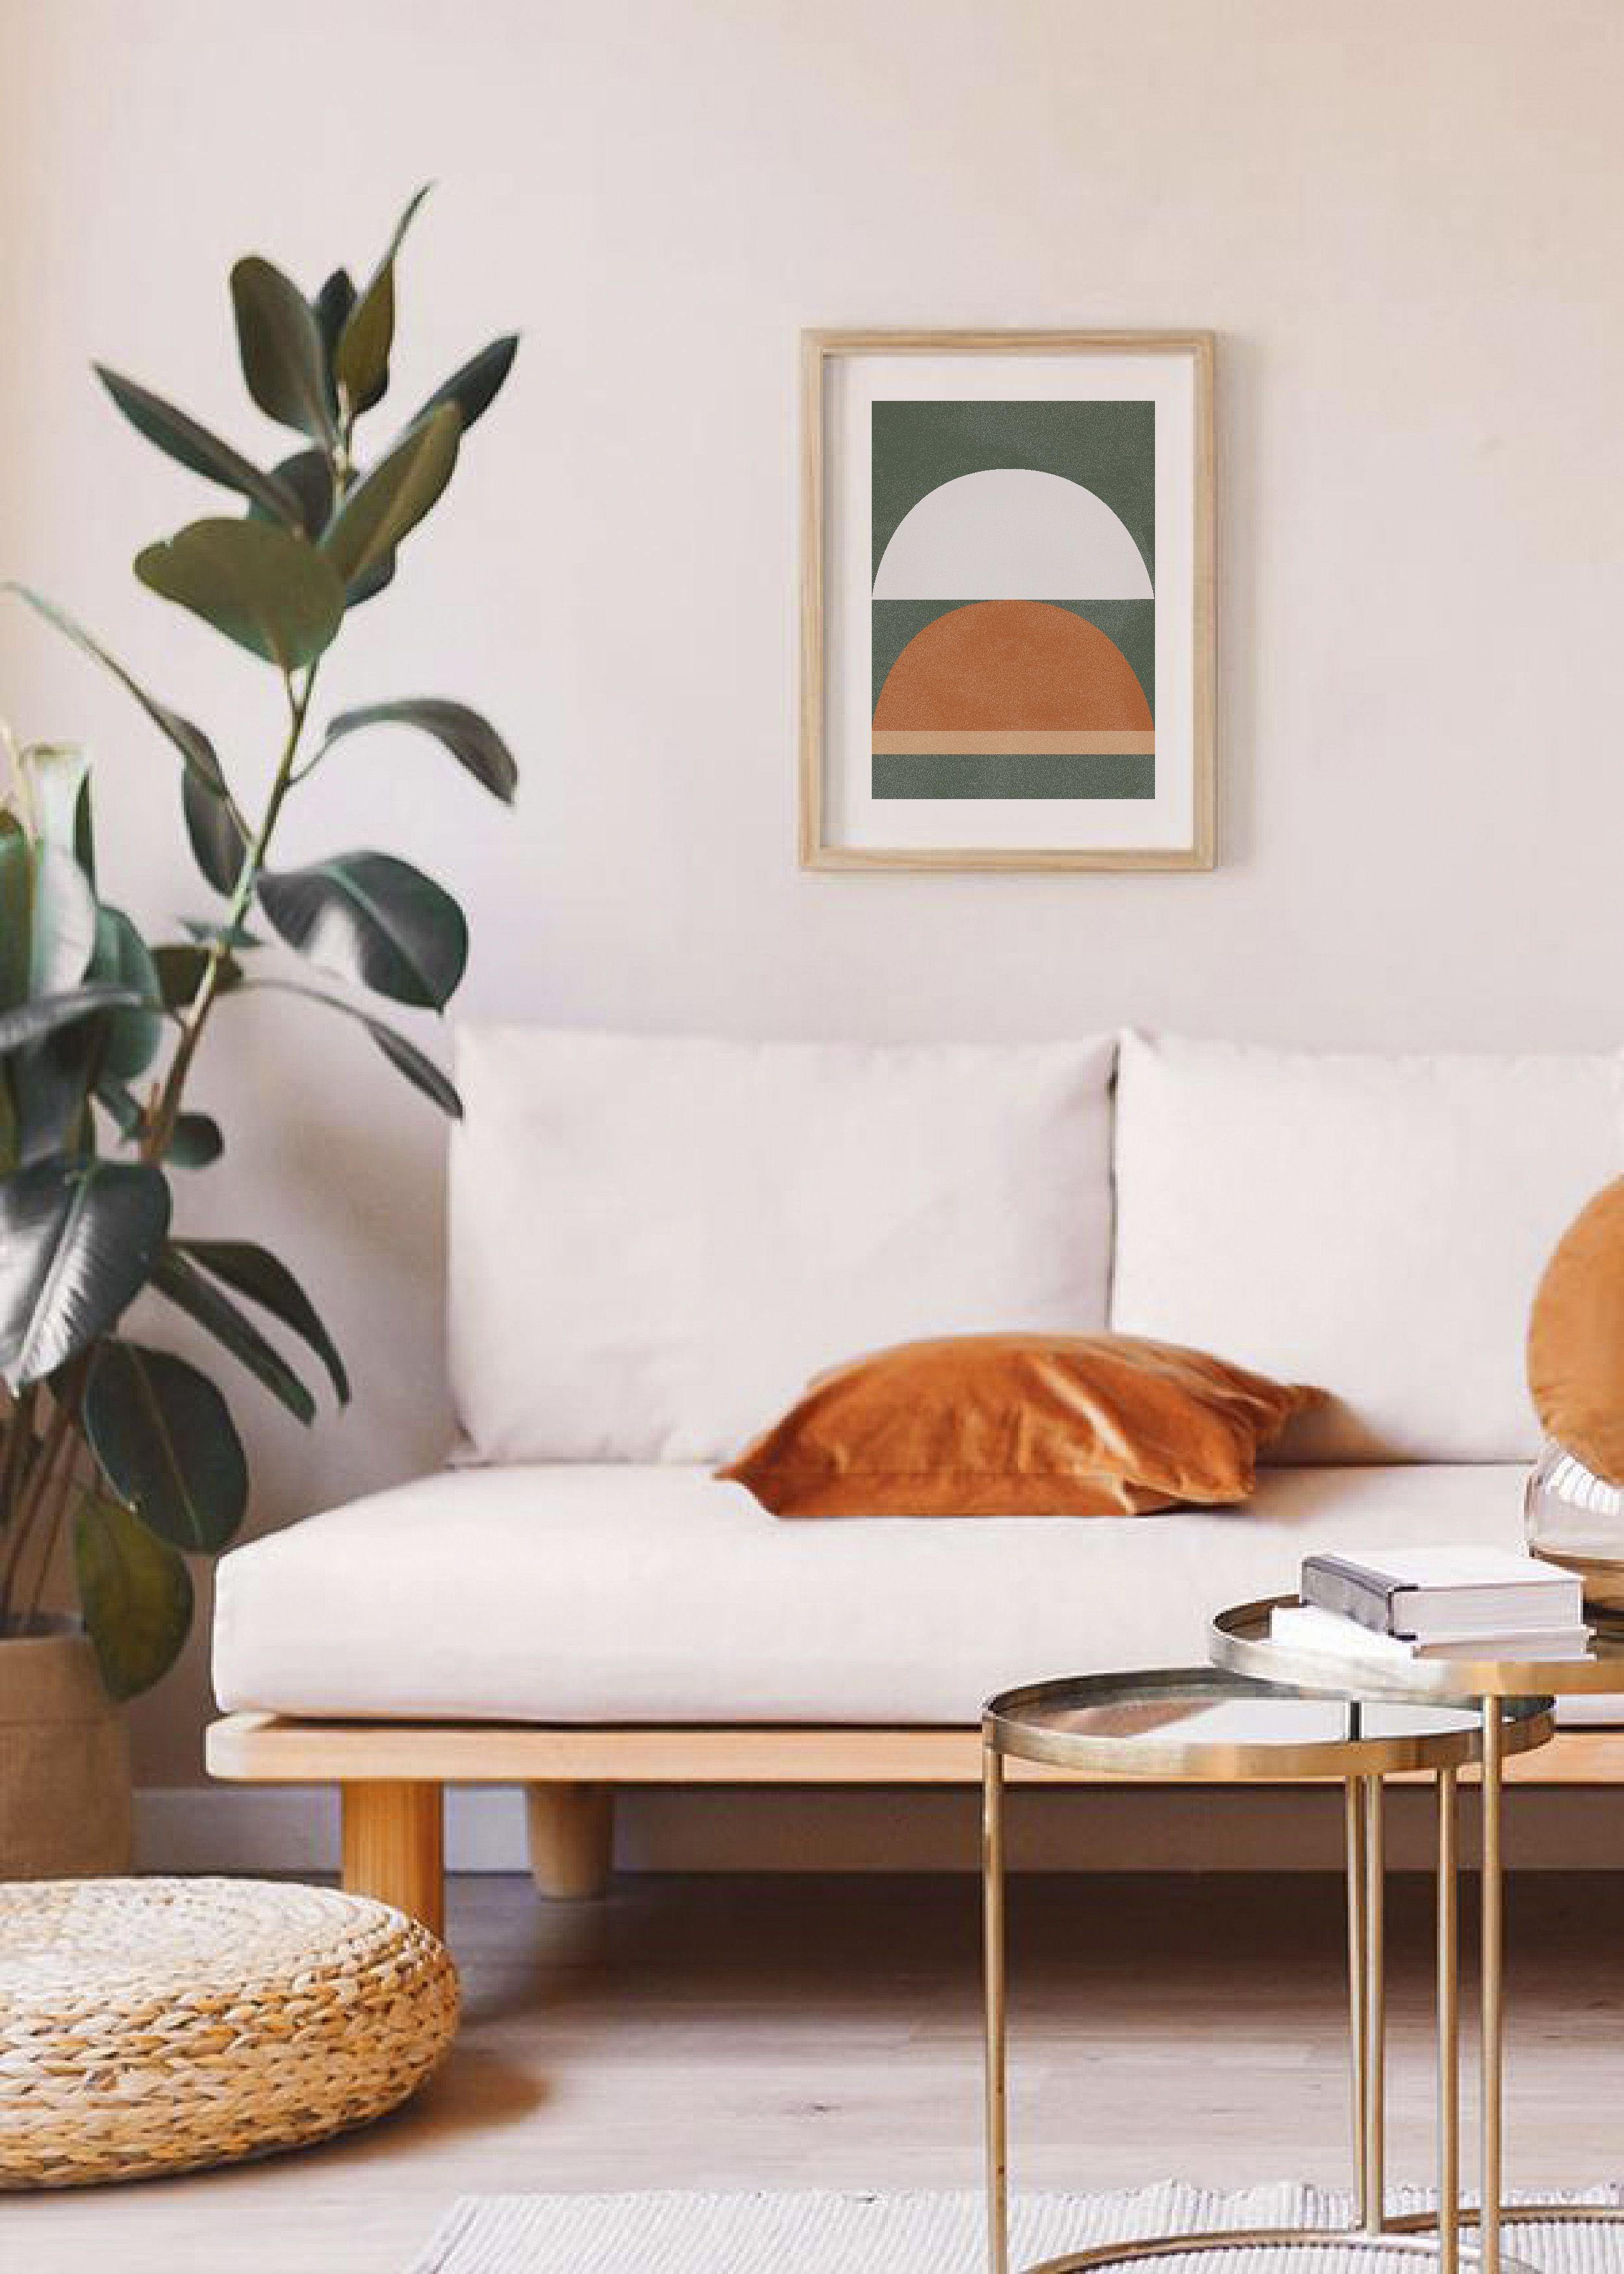 Abstract Wall Art Watercolor Printable Living Room Decor Etsy In 2021 Living Room Decor Etsy Home Decor Living Room Decor